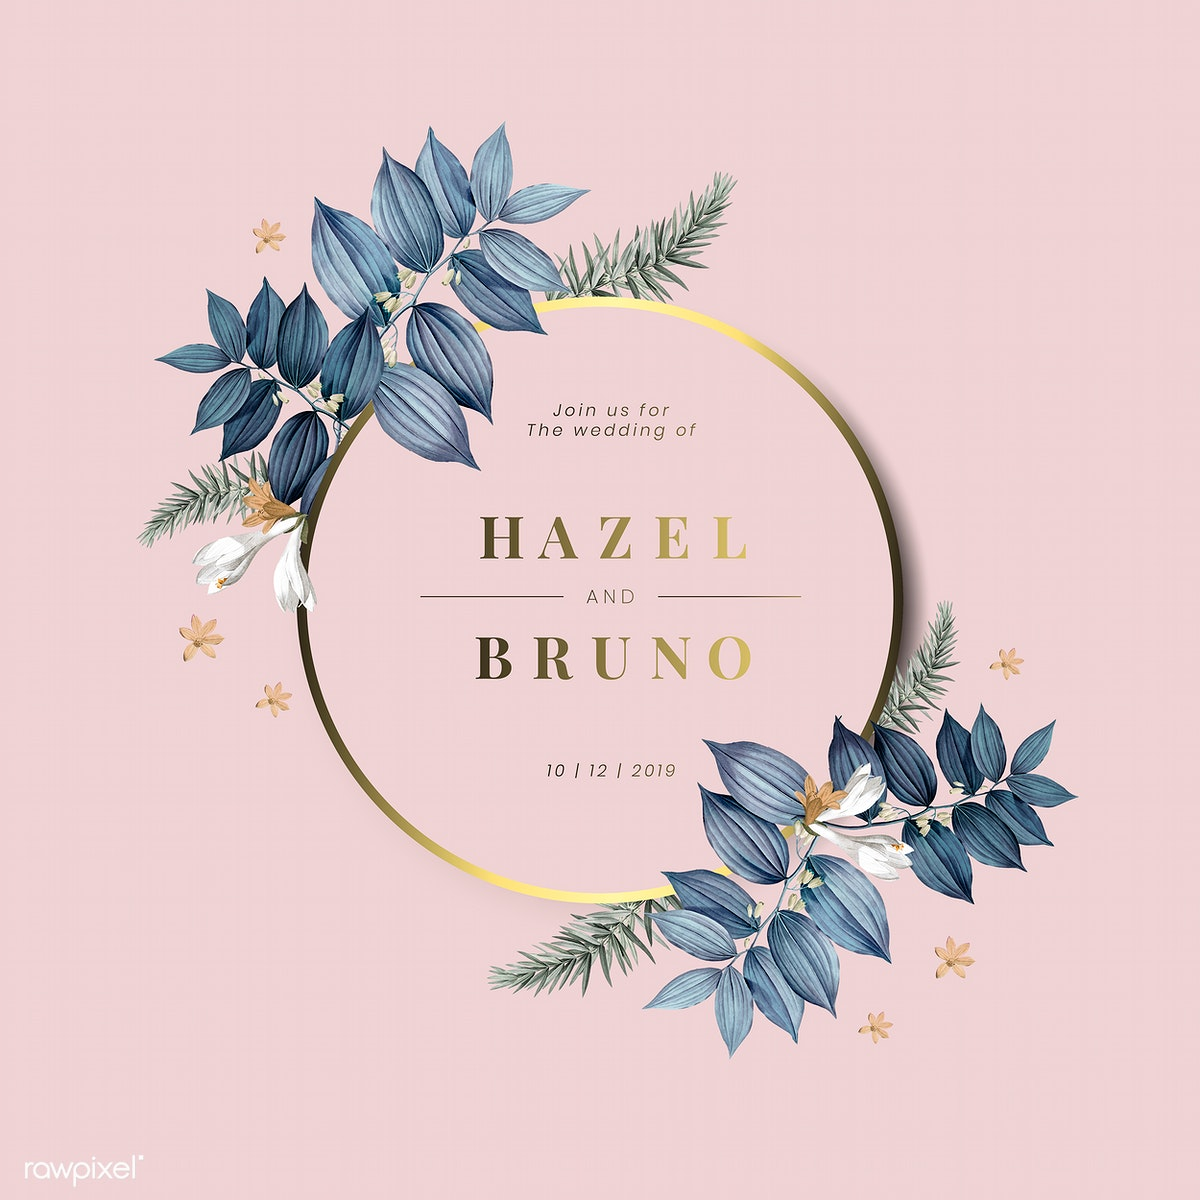 Floral Wedding Invitations.Floral Wedding Invitation Card Design Vector Royalty Free Stock